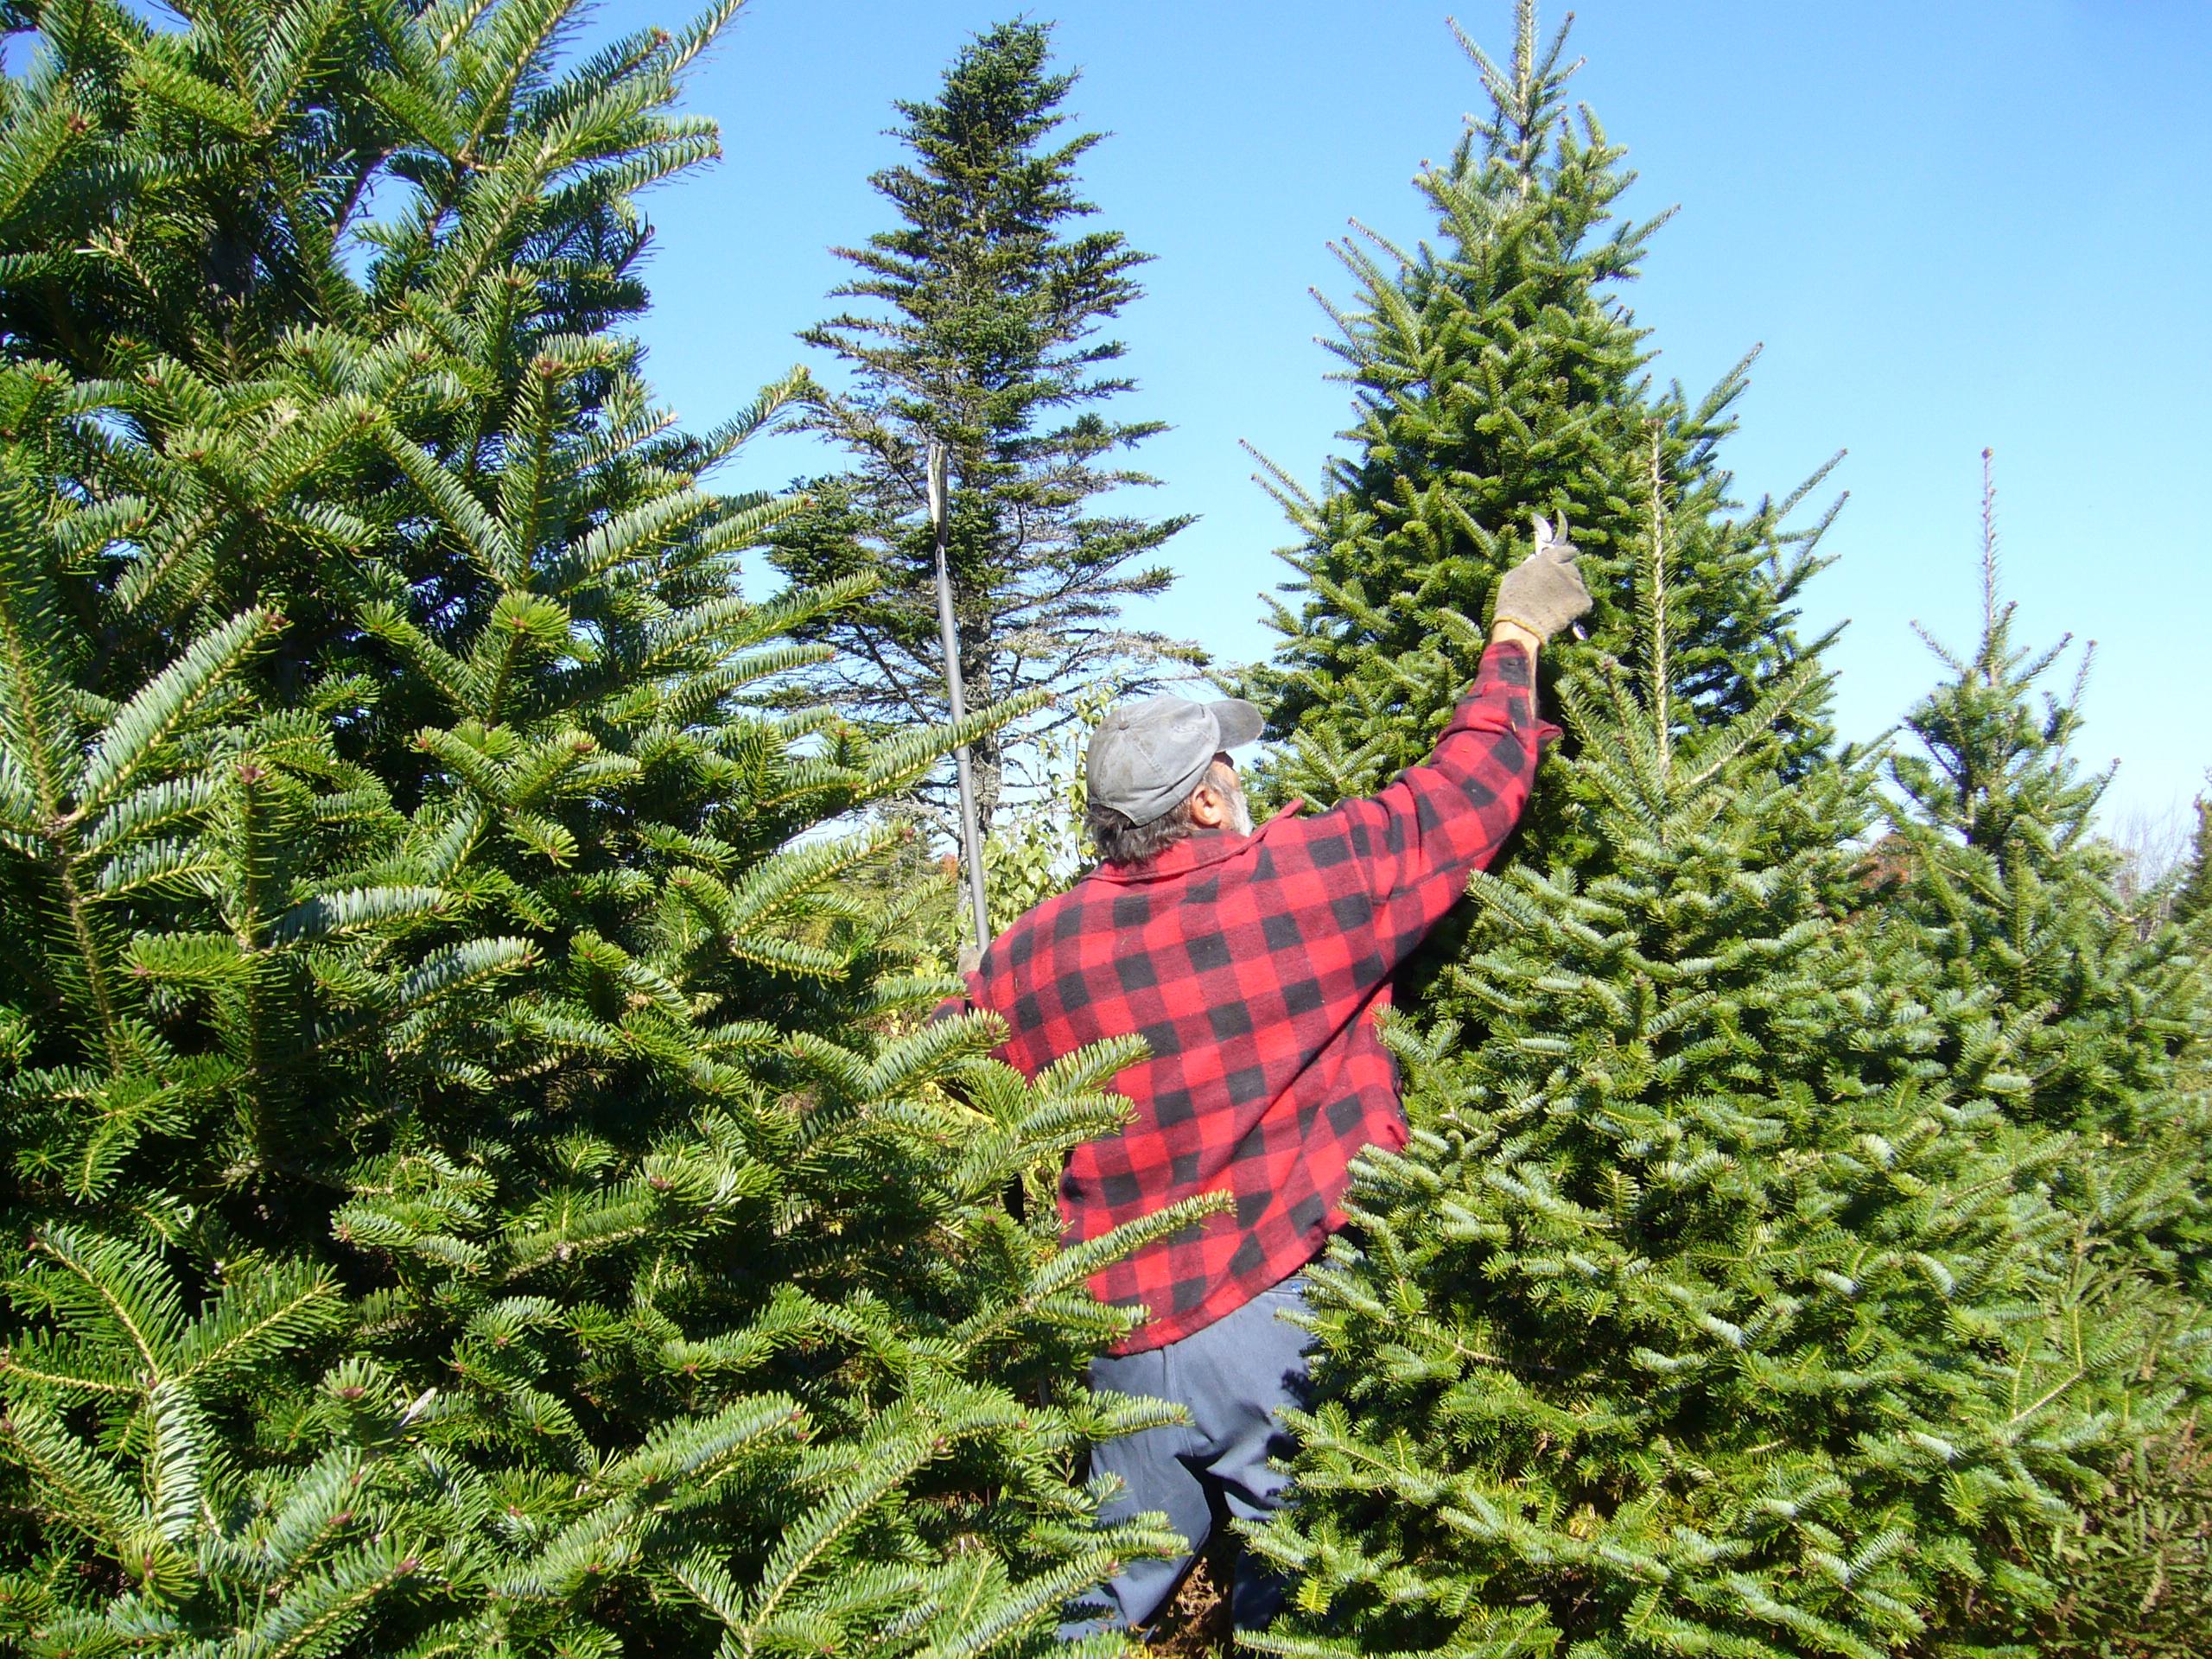 ChristmasTreeShortage.jpg